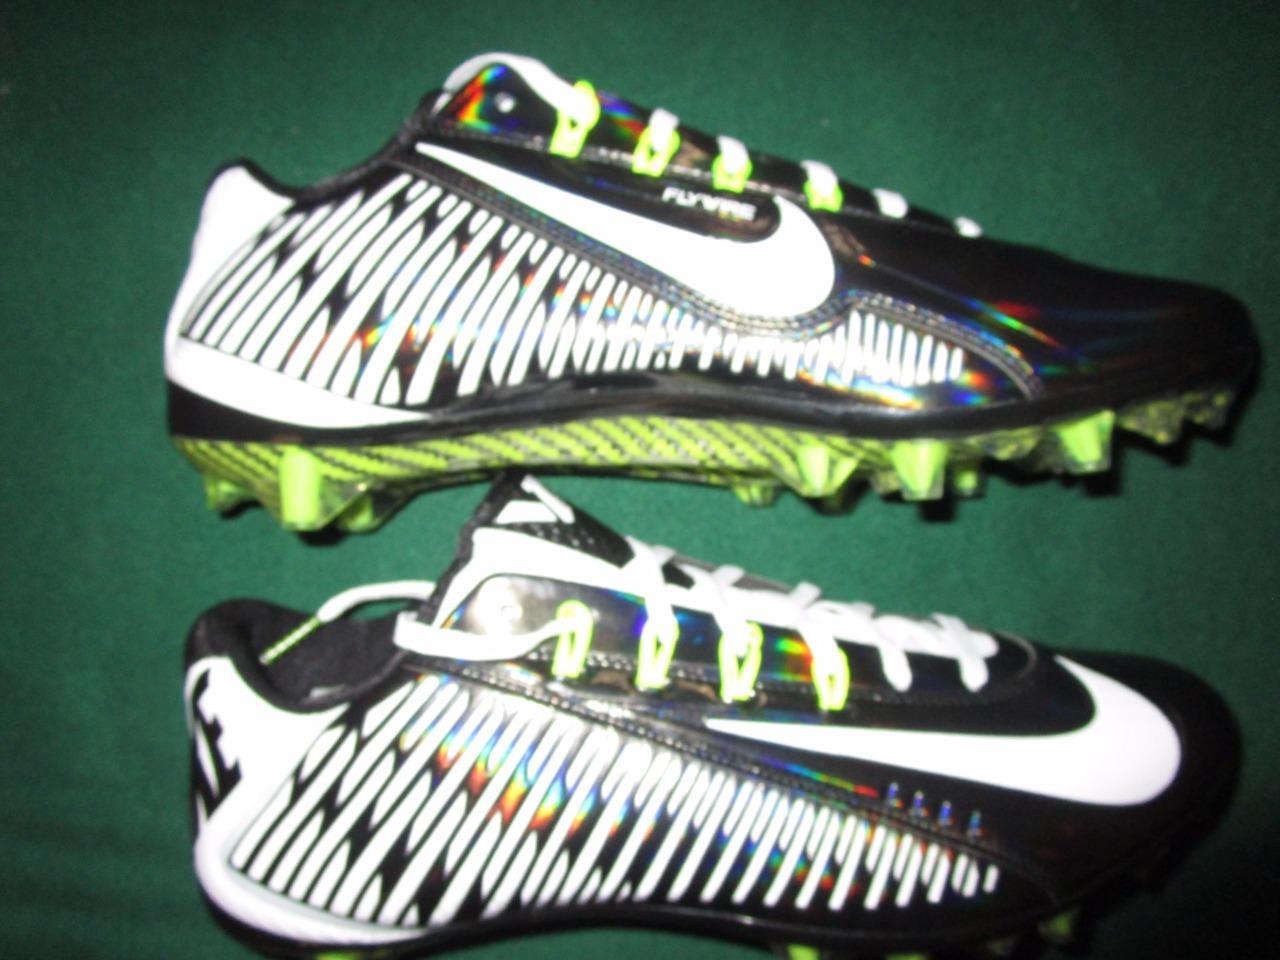 Nike-Vapor-Carbon-Elite-2014-TD-Football-Cleats-